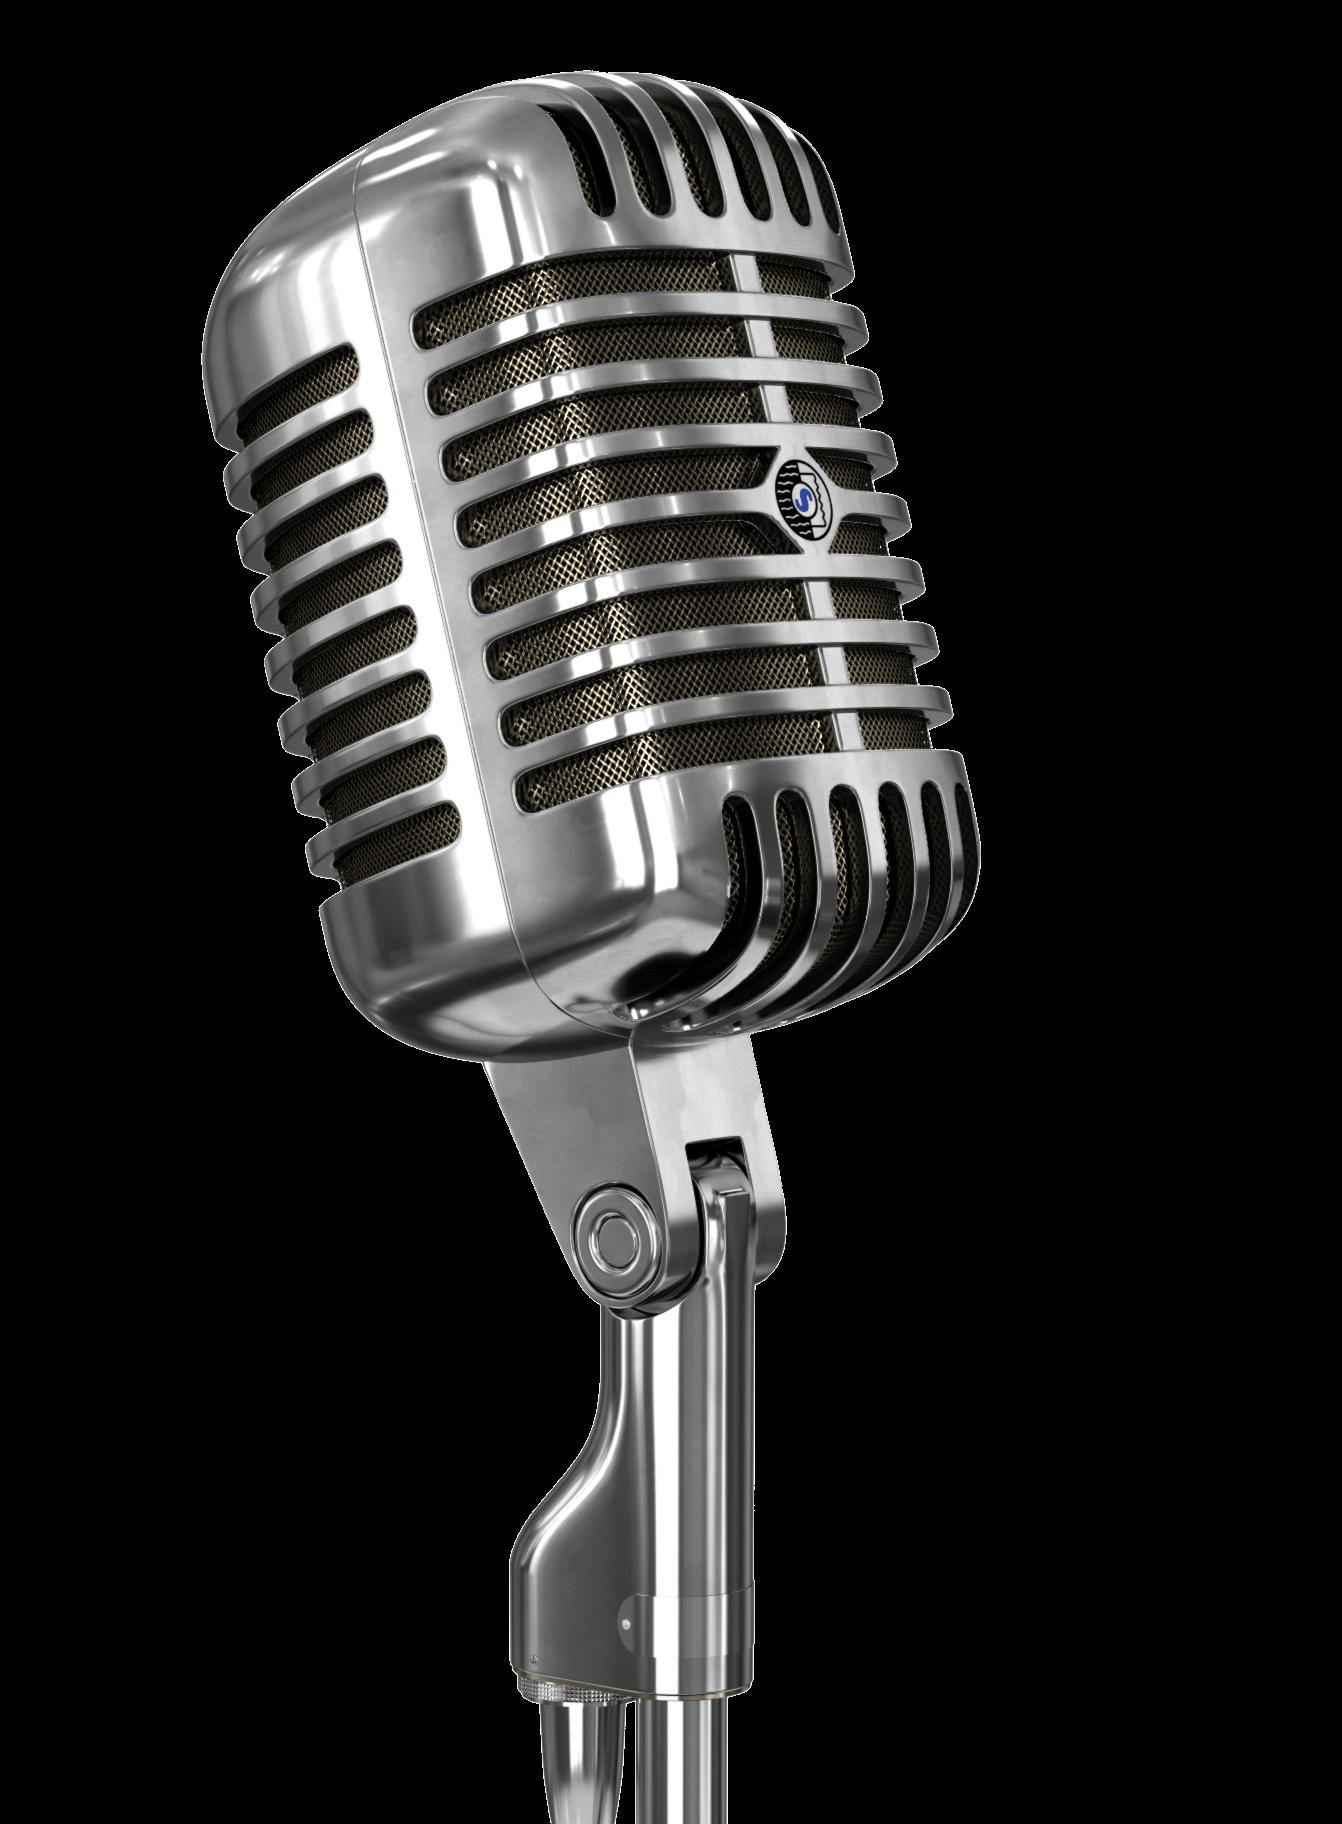 Http Www Freepngimg Com Download Microphone 4 Microphone Png Image Png Vintage Microphone Old Microphone Microphone Tattoo